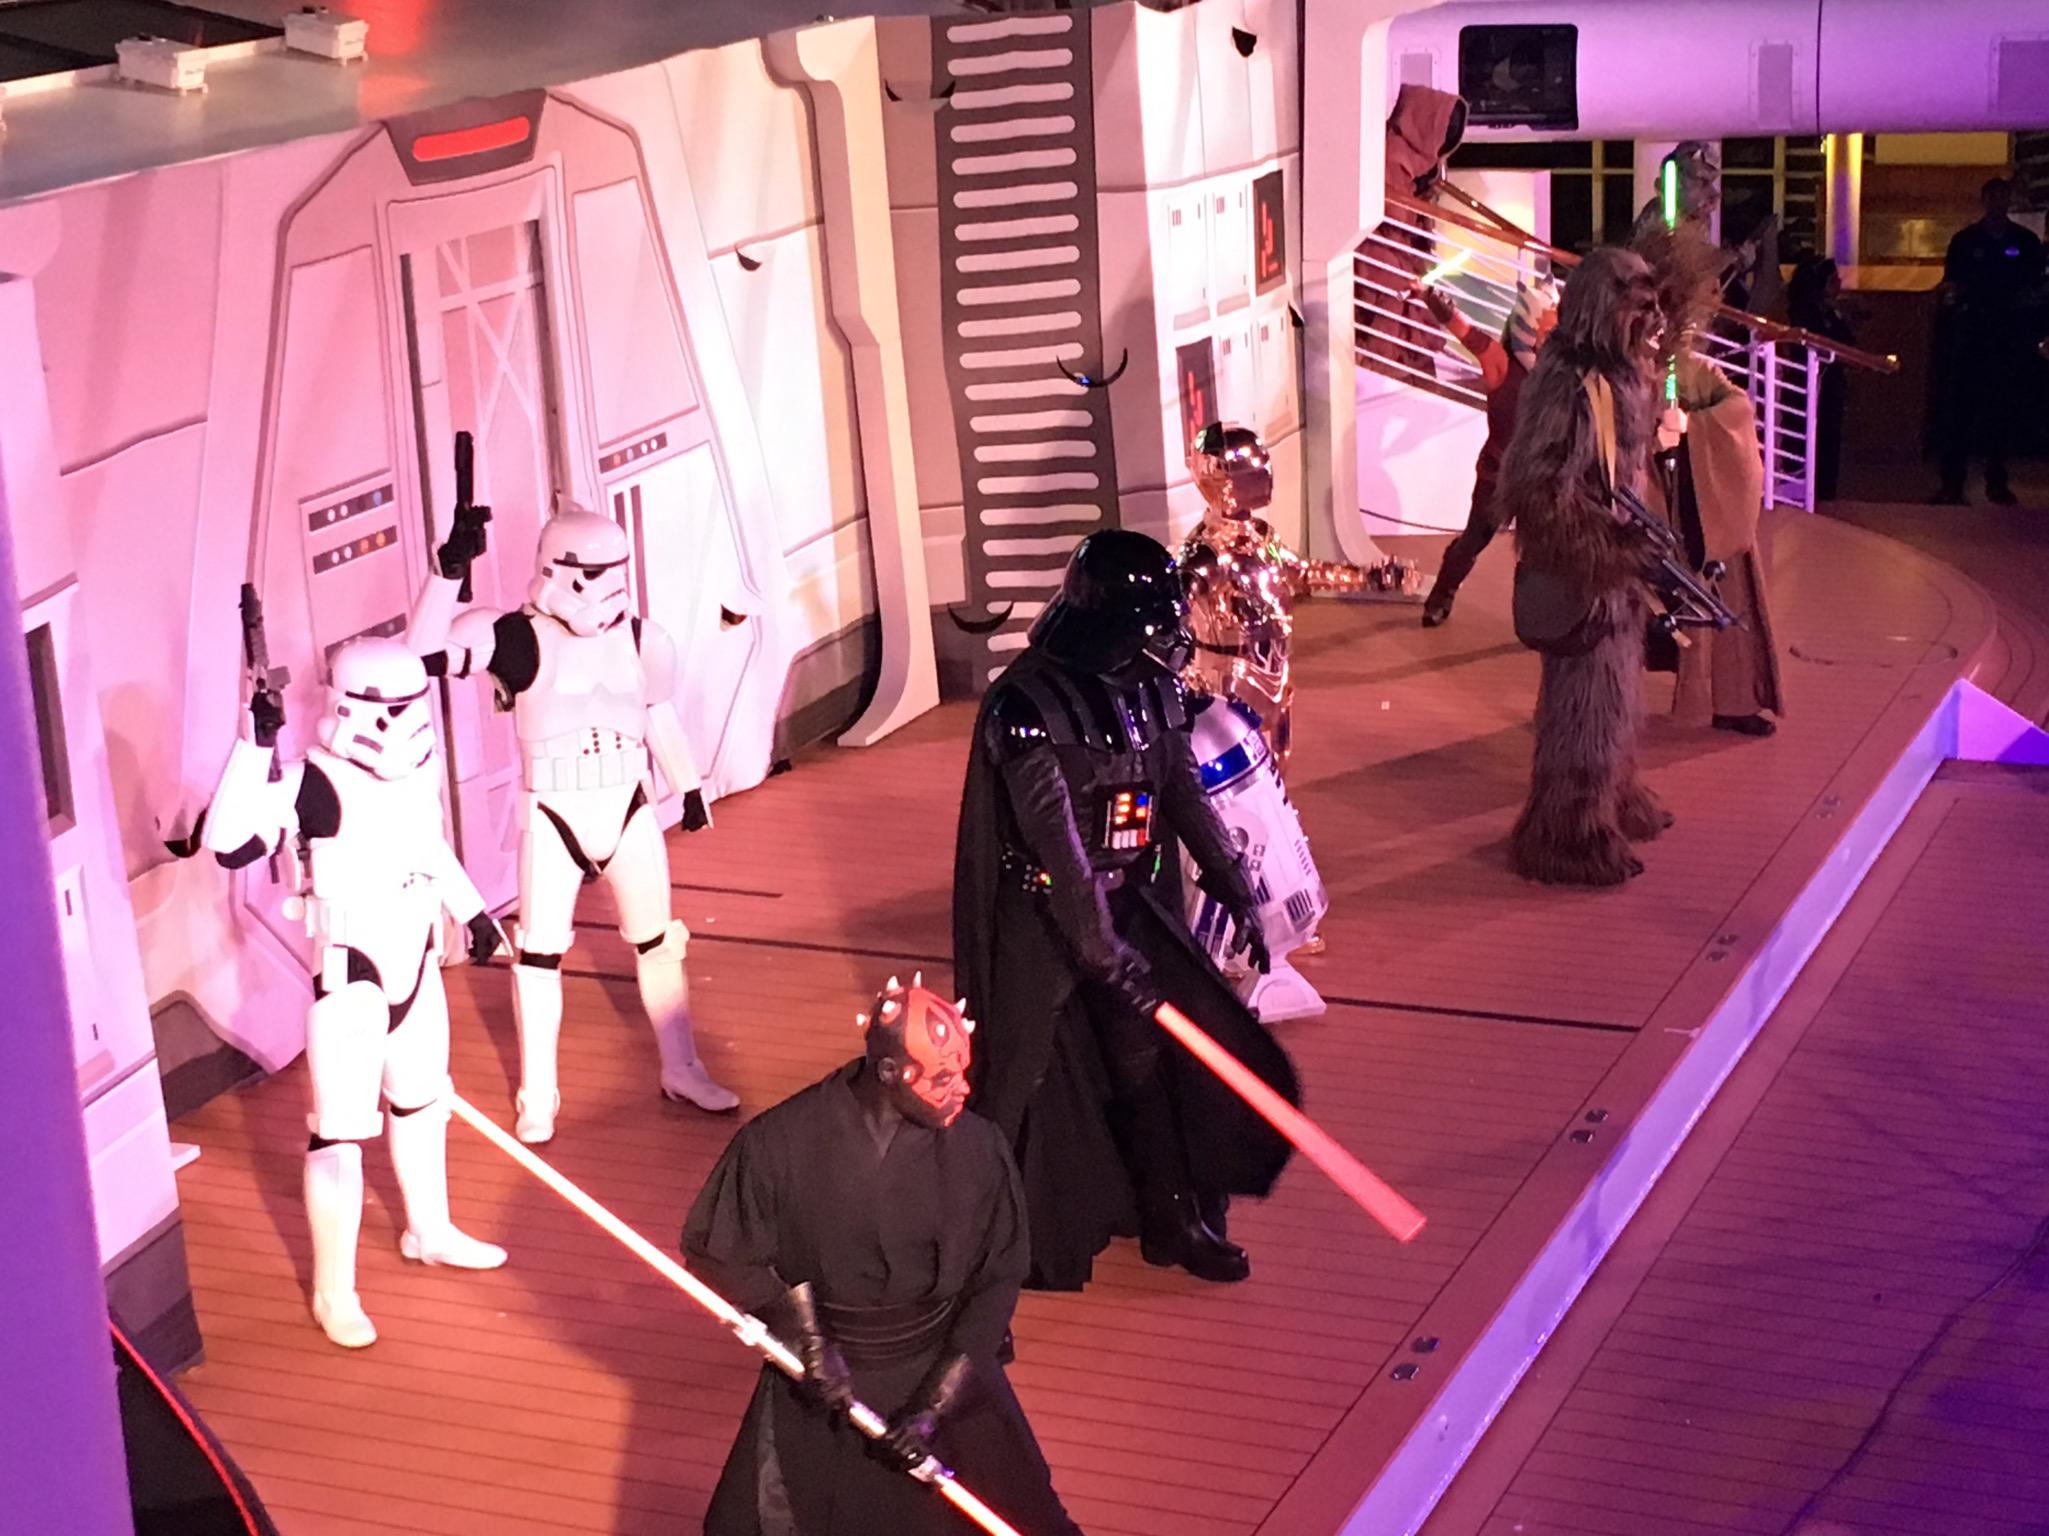 Star Wars Awaken the Force Show 2